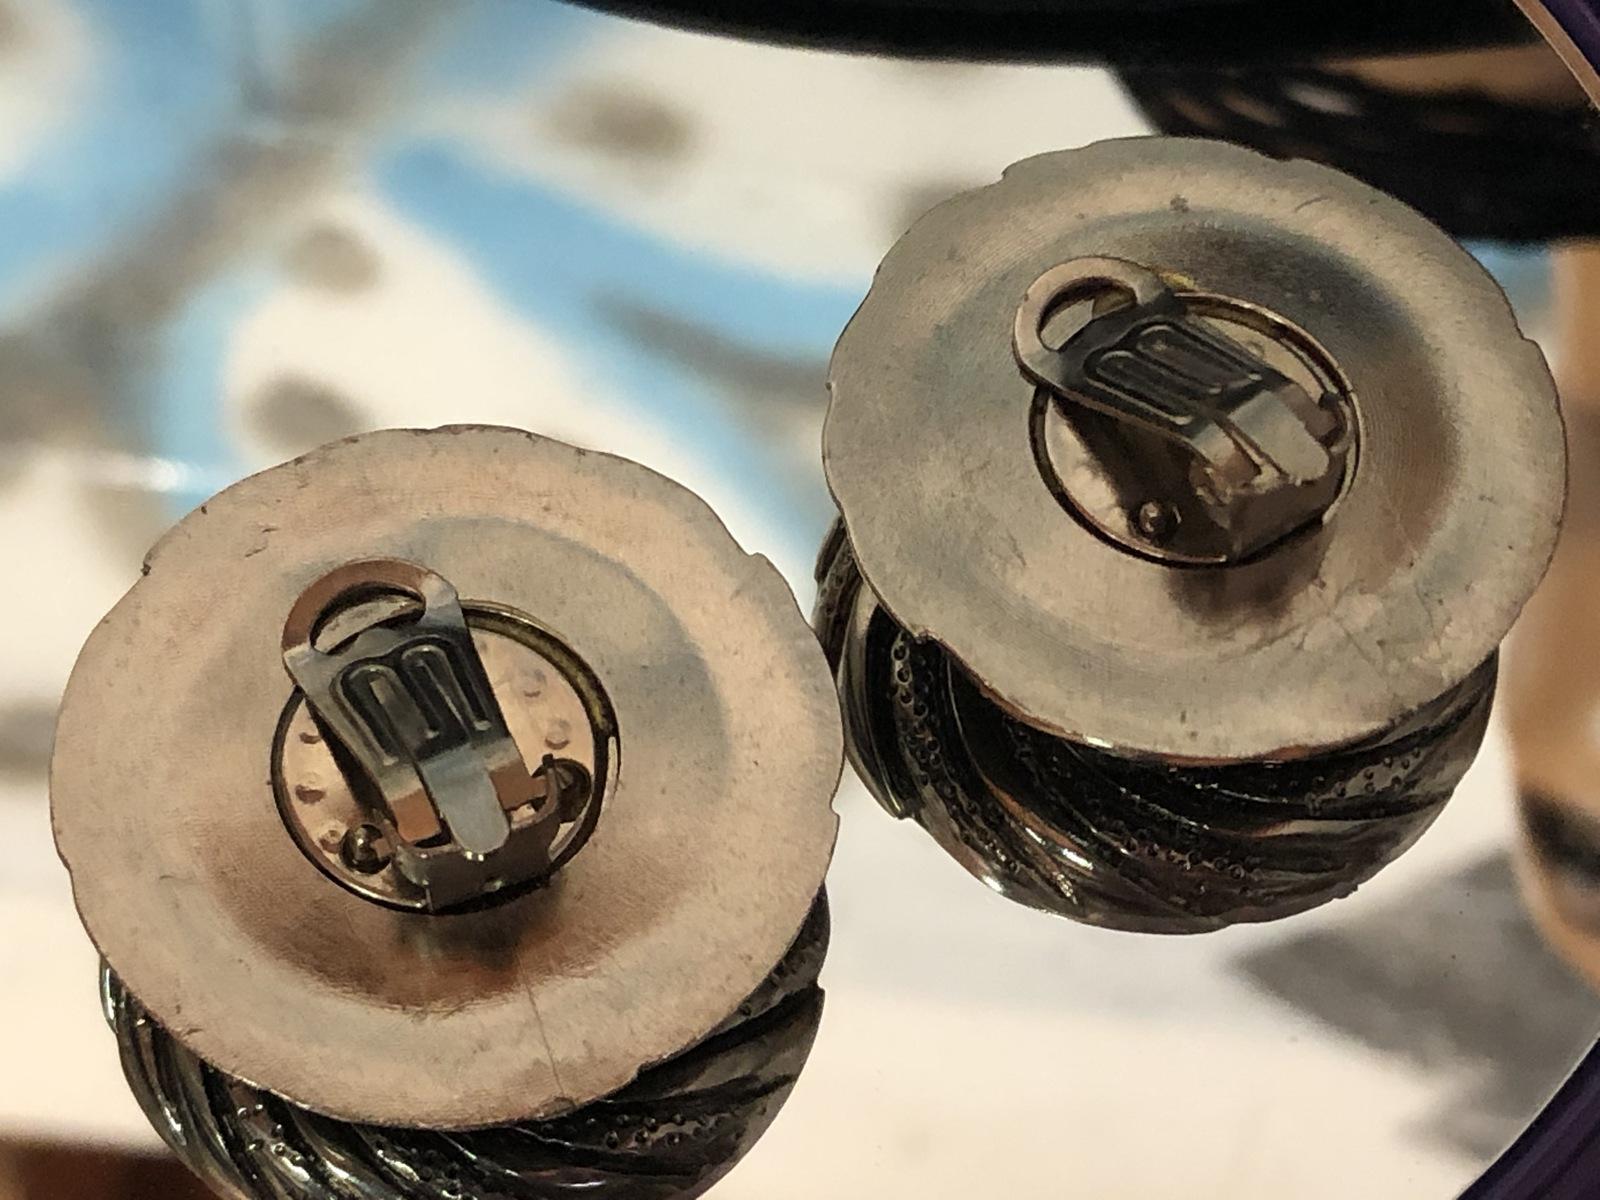 VTG 80s Swirl Medallion Olive-Bronze Centers/Silvertone Round Clip On Earrings image 2